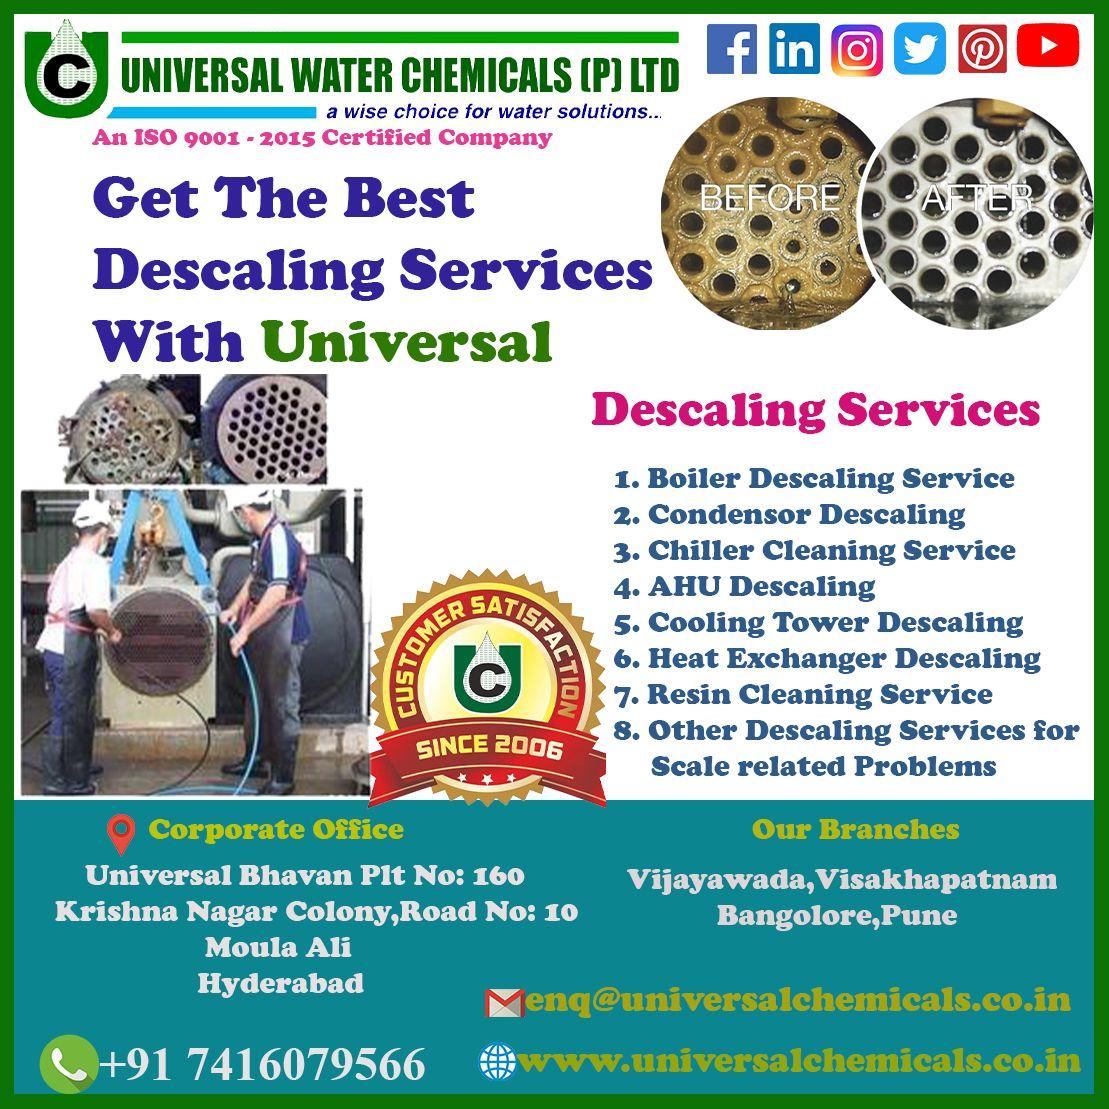 UNIVERSAL WATER CHEMICALS!!! UniversalWaterChemicals,